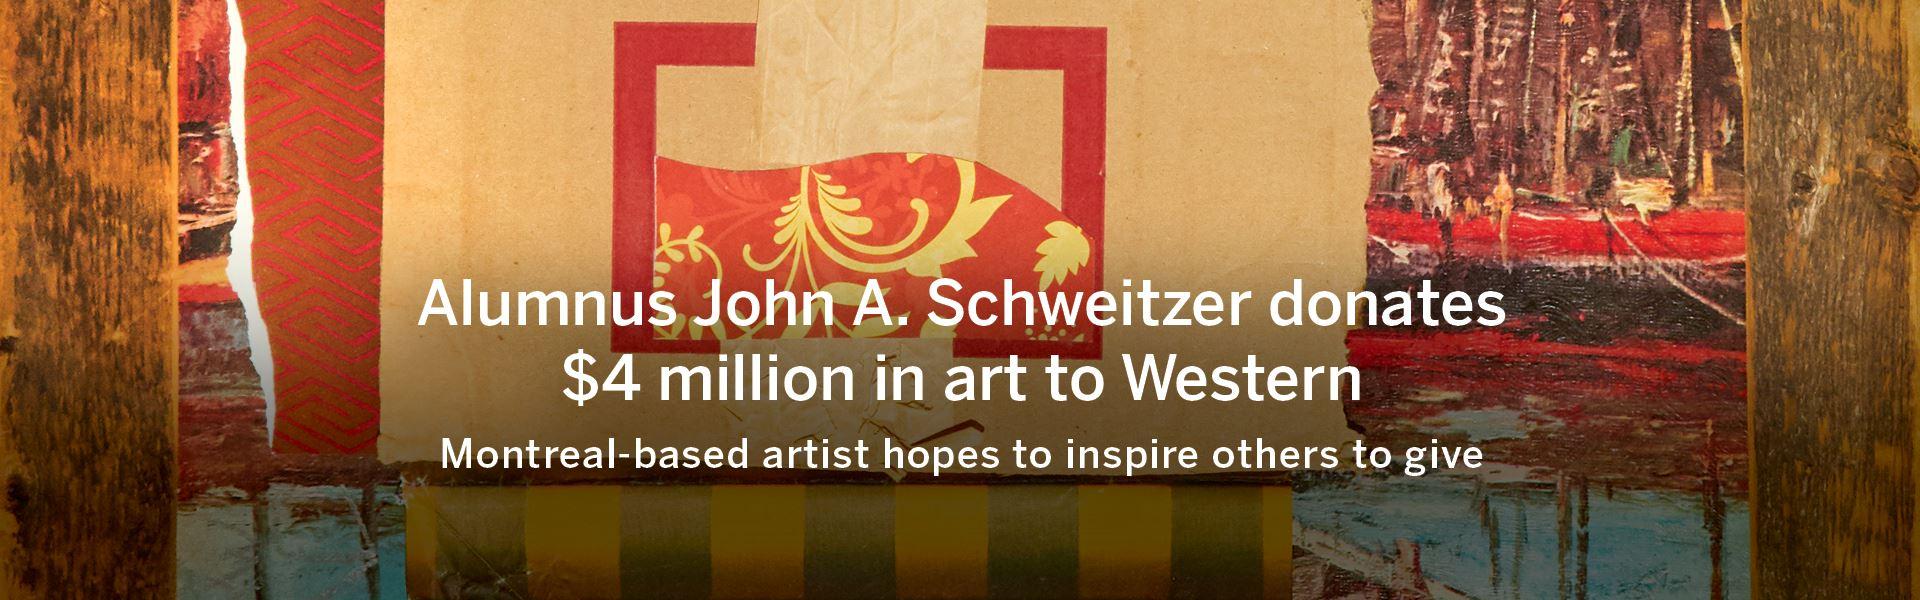 Alumnus John A. Schweitzer donates $4 million in art to Western